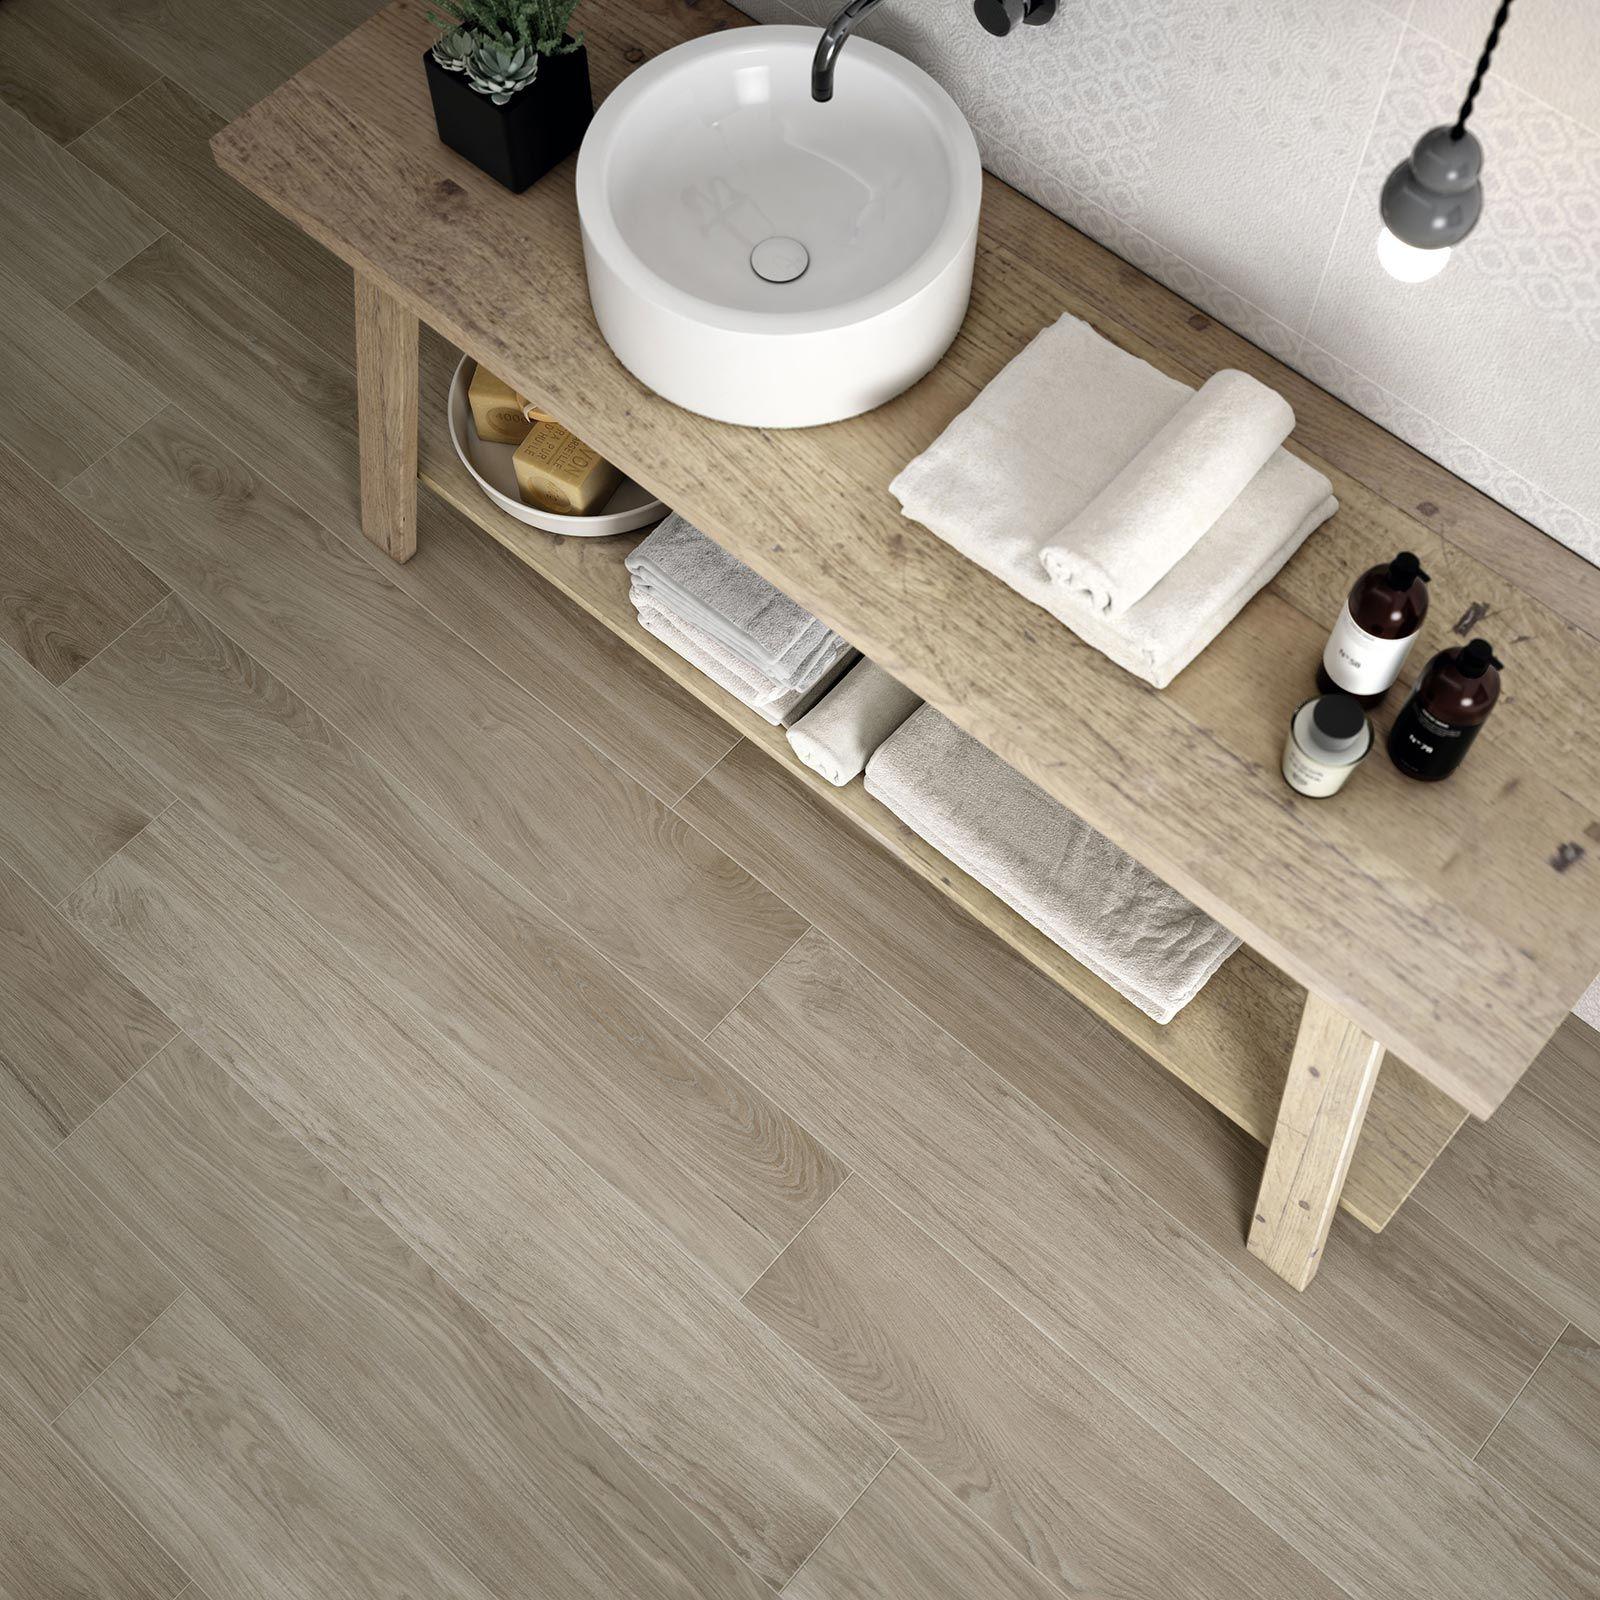 Pavimento Effetto Parquet Marazzi treverkmust - pavimento effetto legno | marazzi | piastrelle